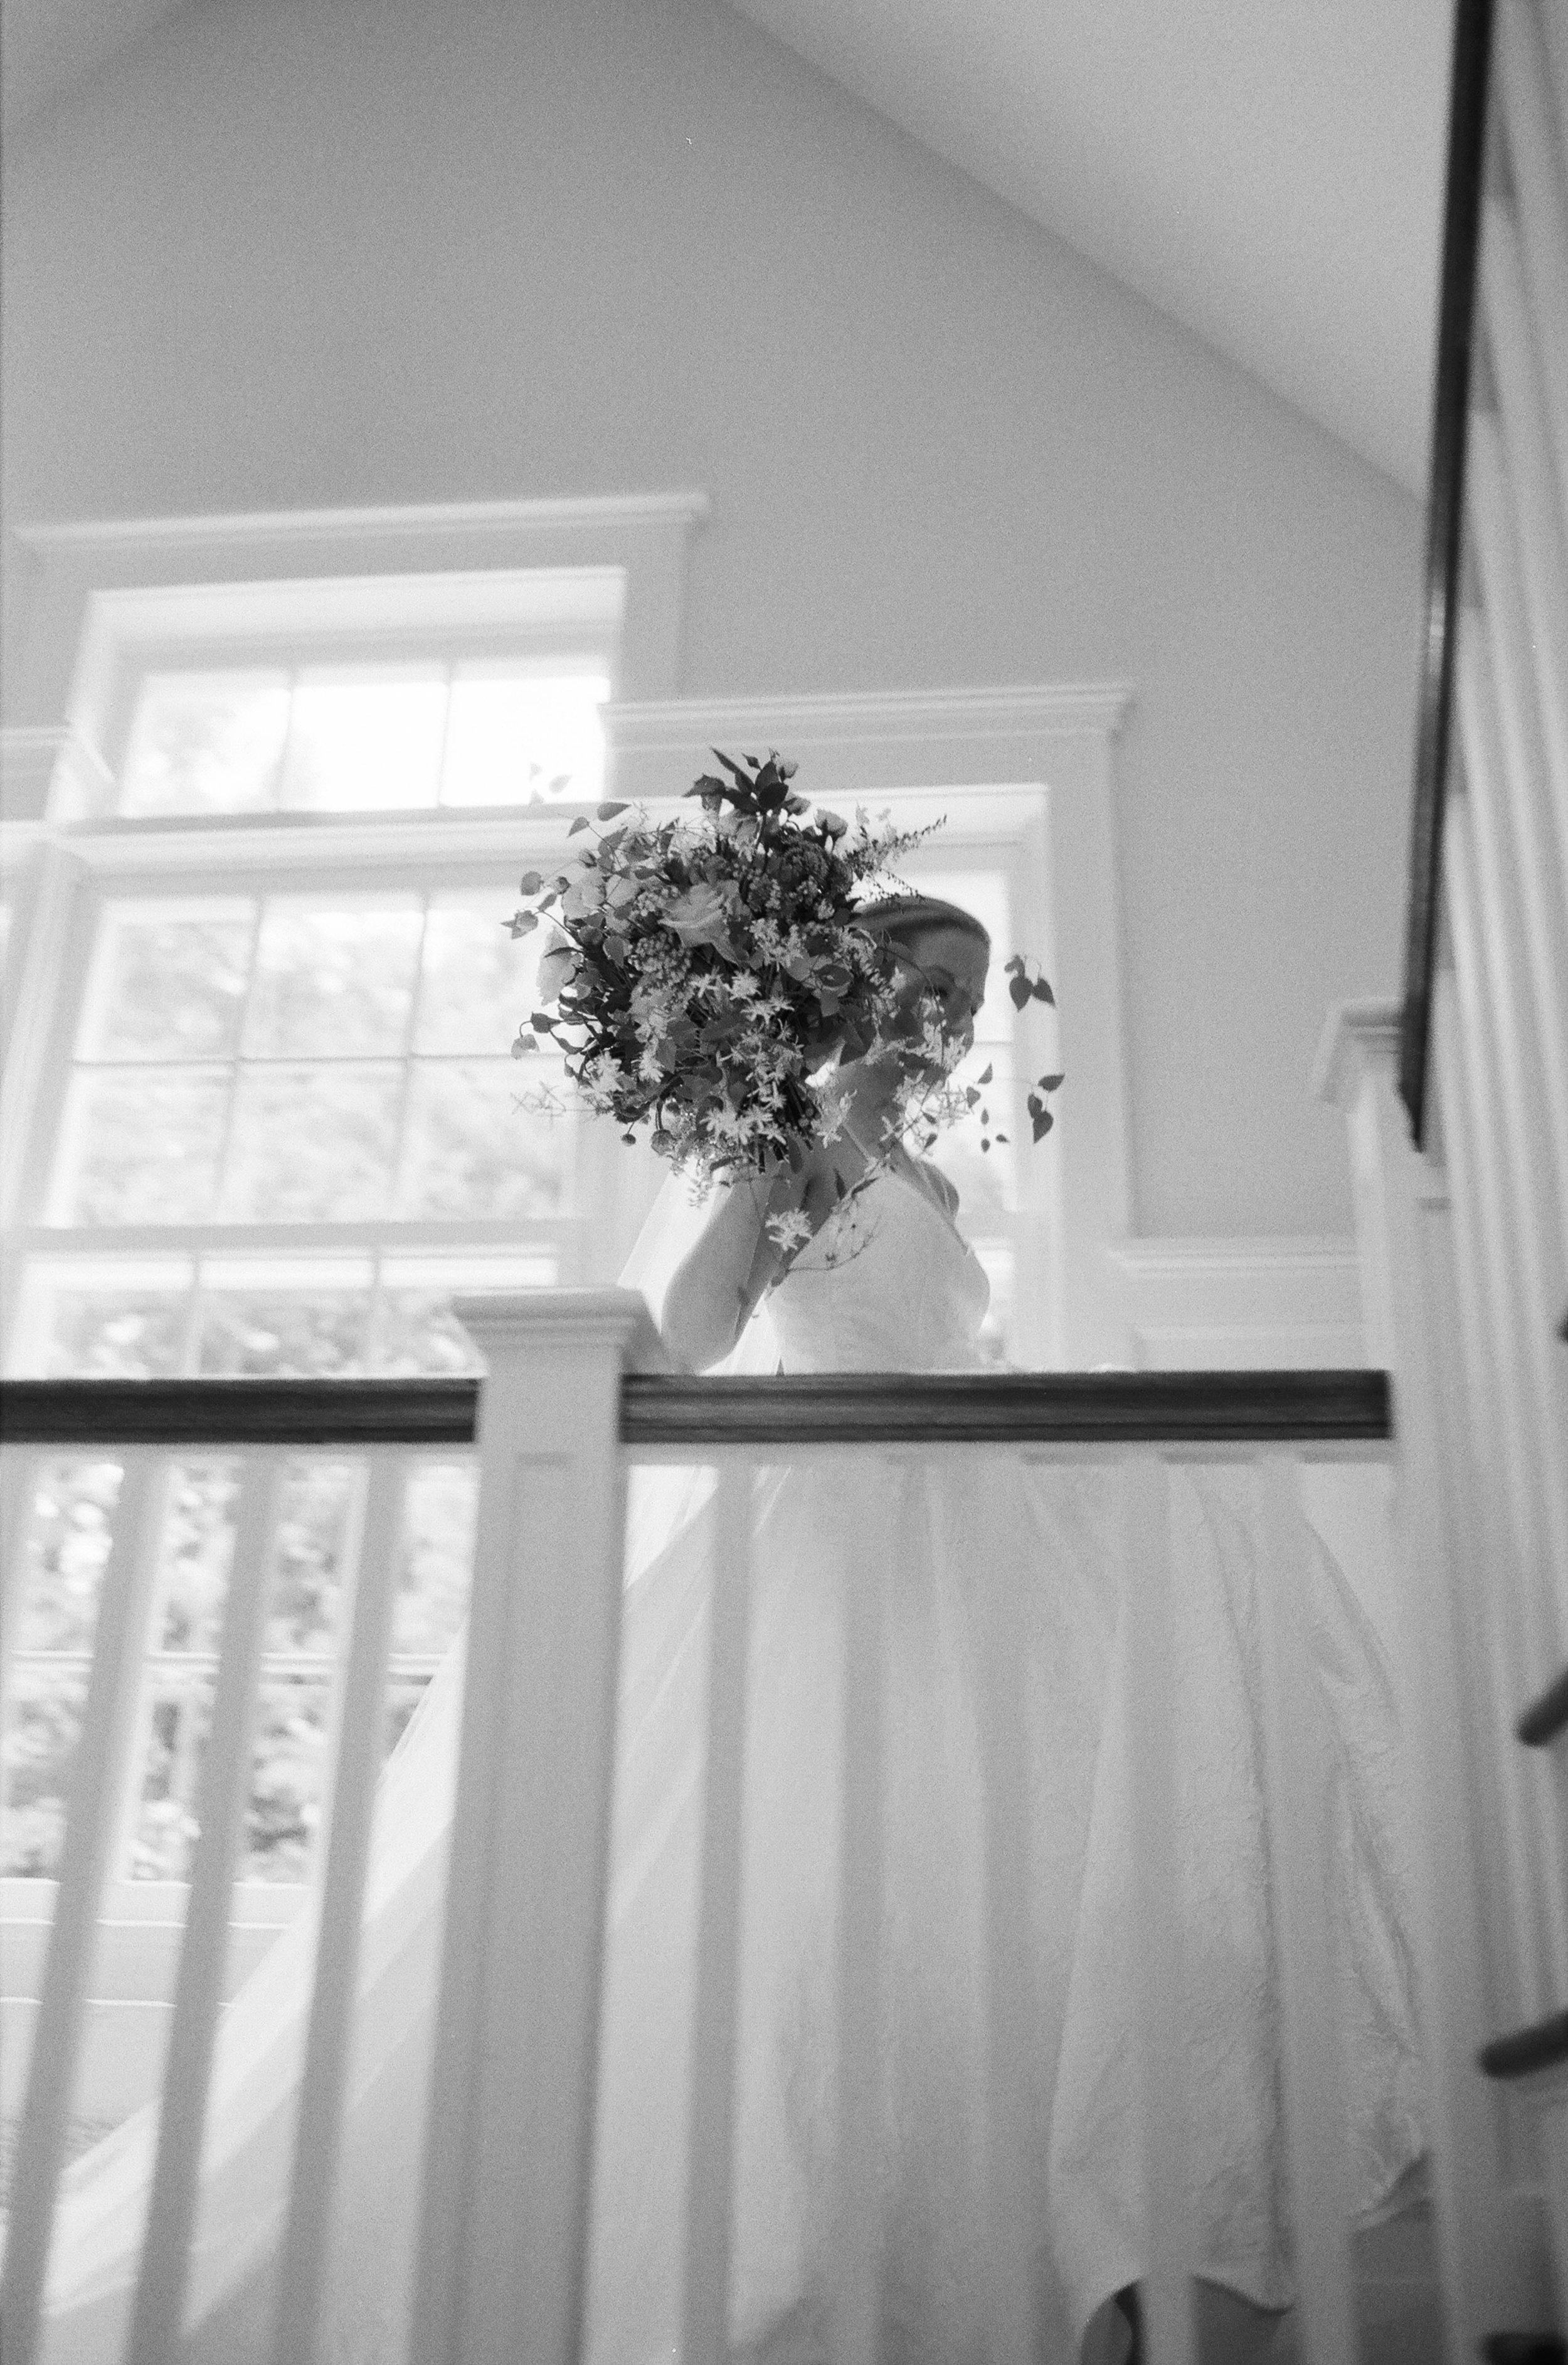 Connecticut-Wedding-6-Jen-Huang-20170909-KB-577-Jen_Huang-000021920028.jpg